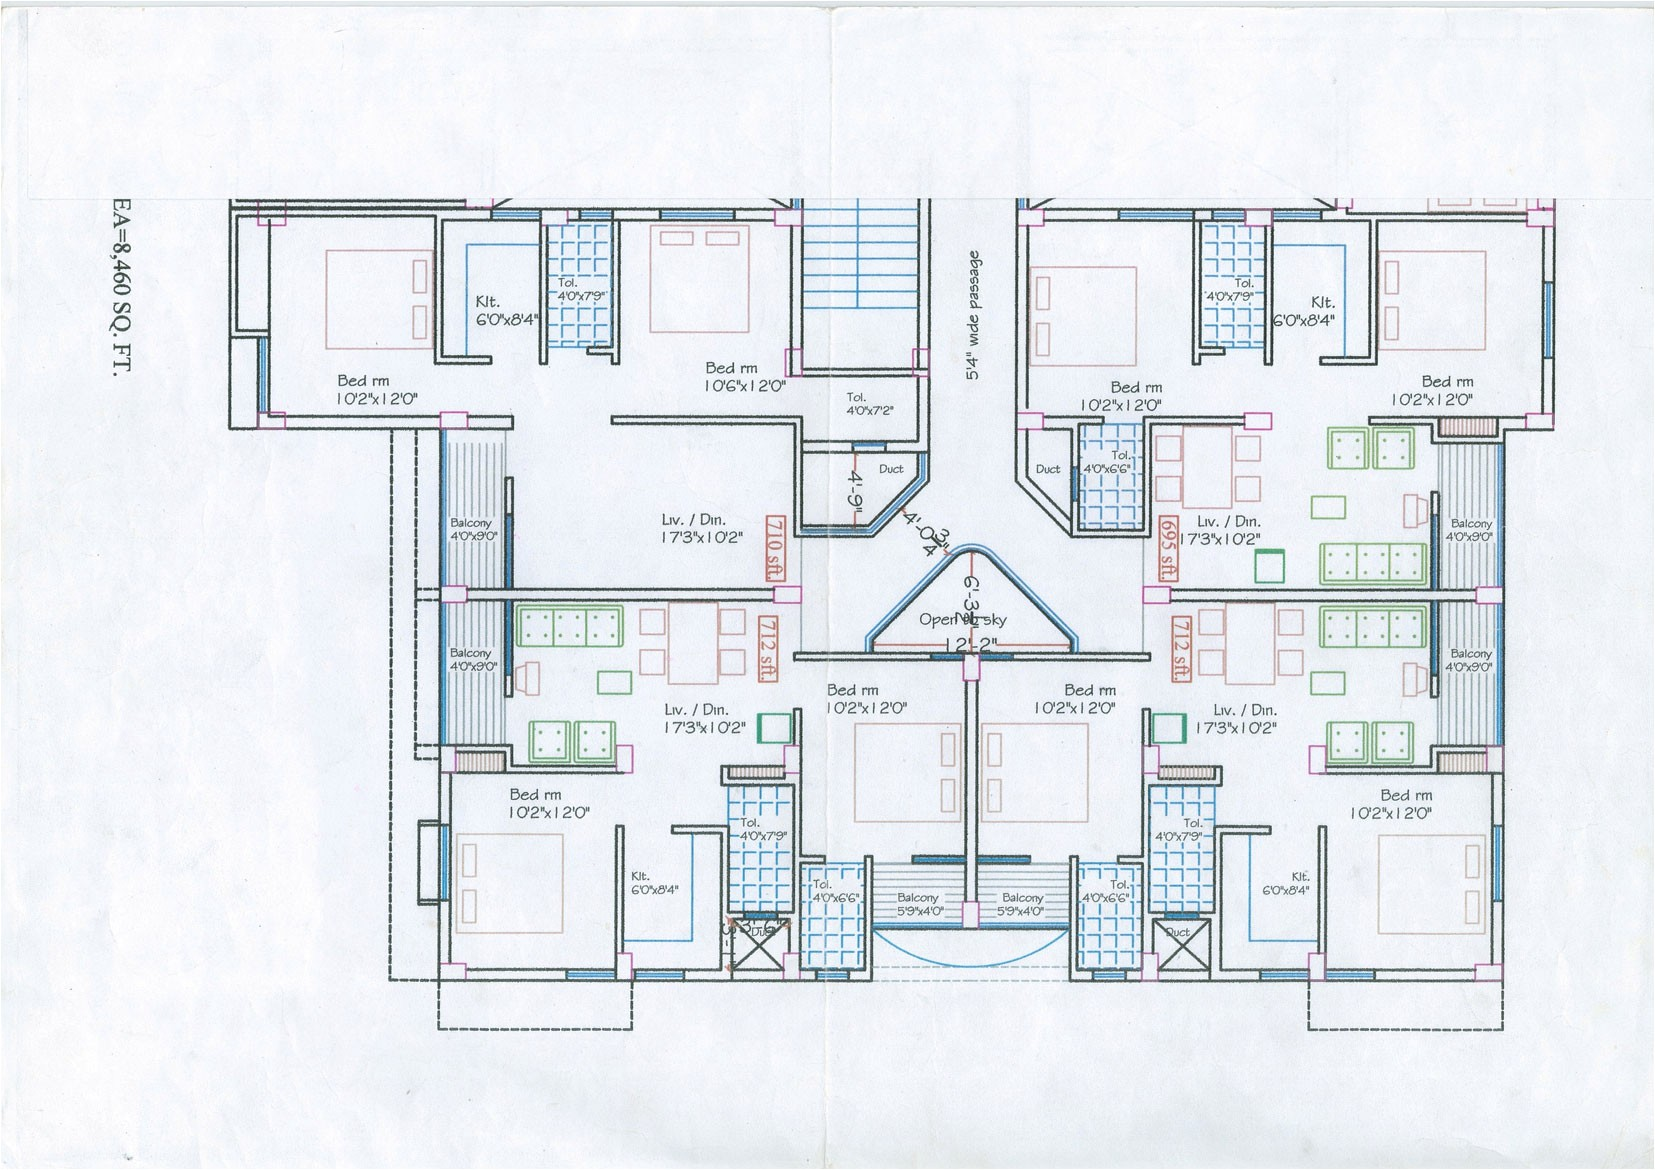 hgtv dream home floor plan 3